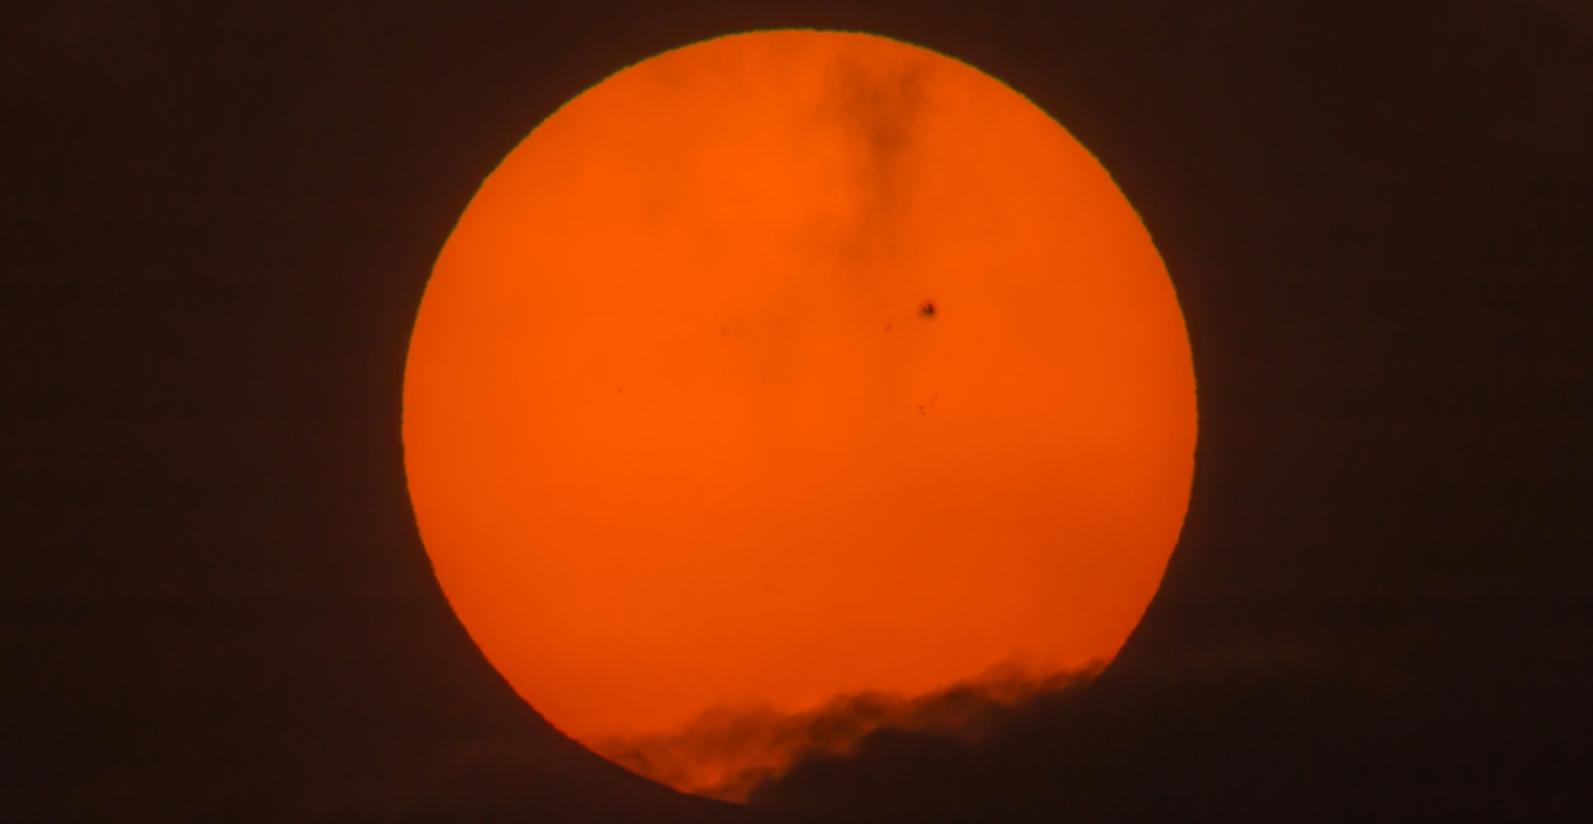 Sunspot image by PEERAPIXSCOM via Shutterstock.com